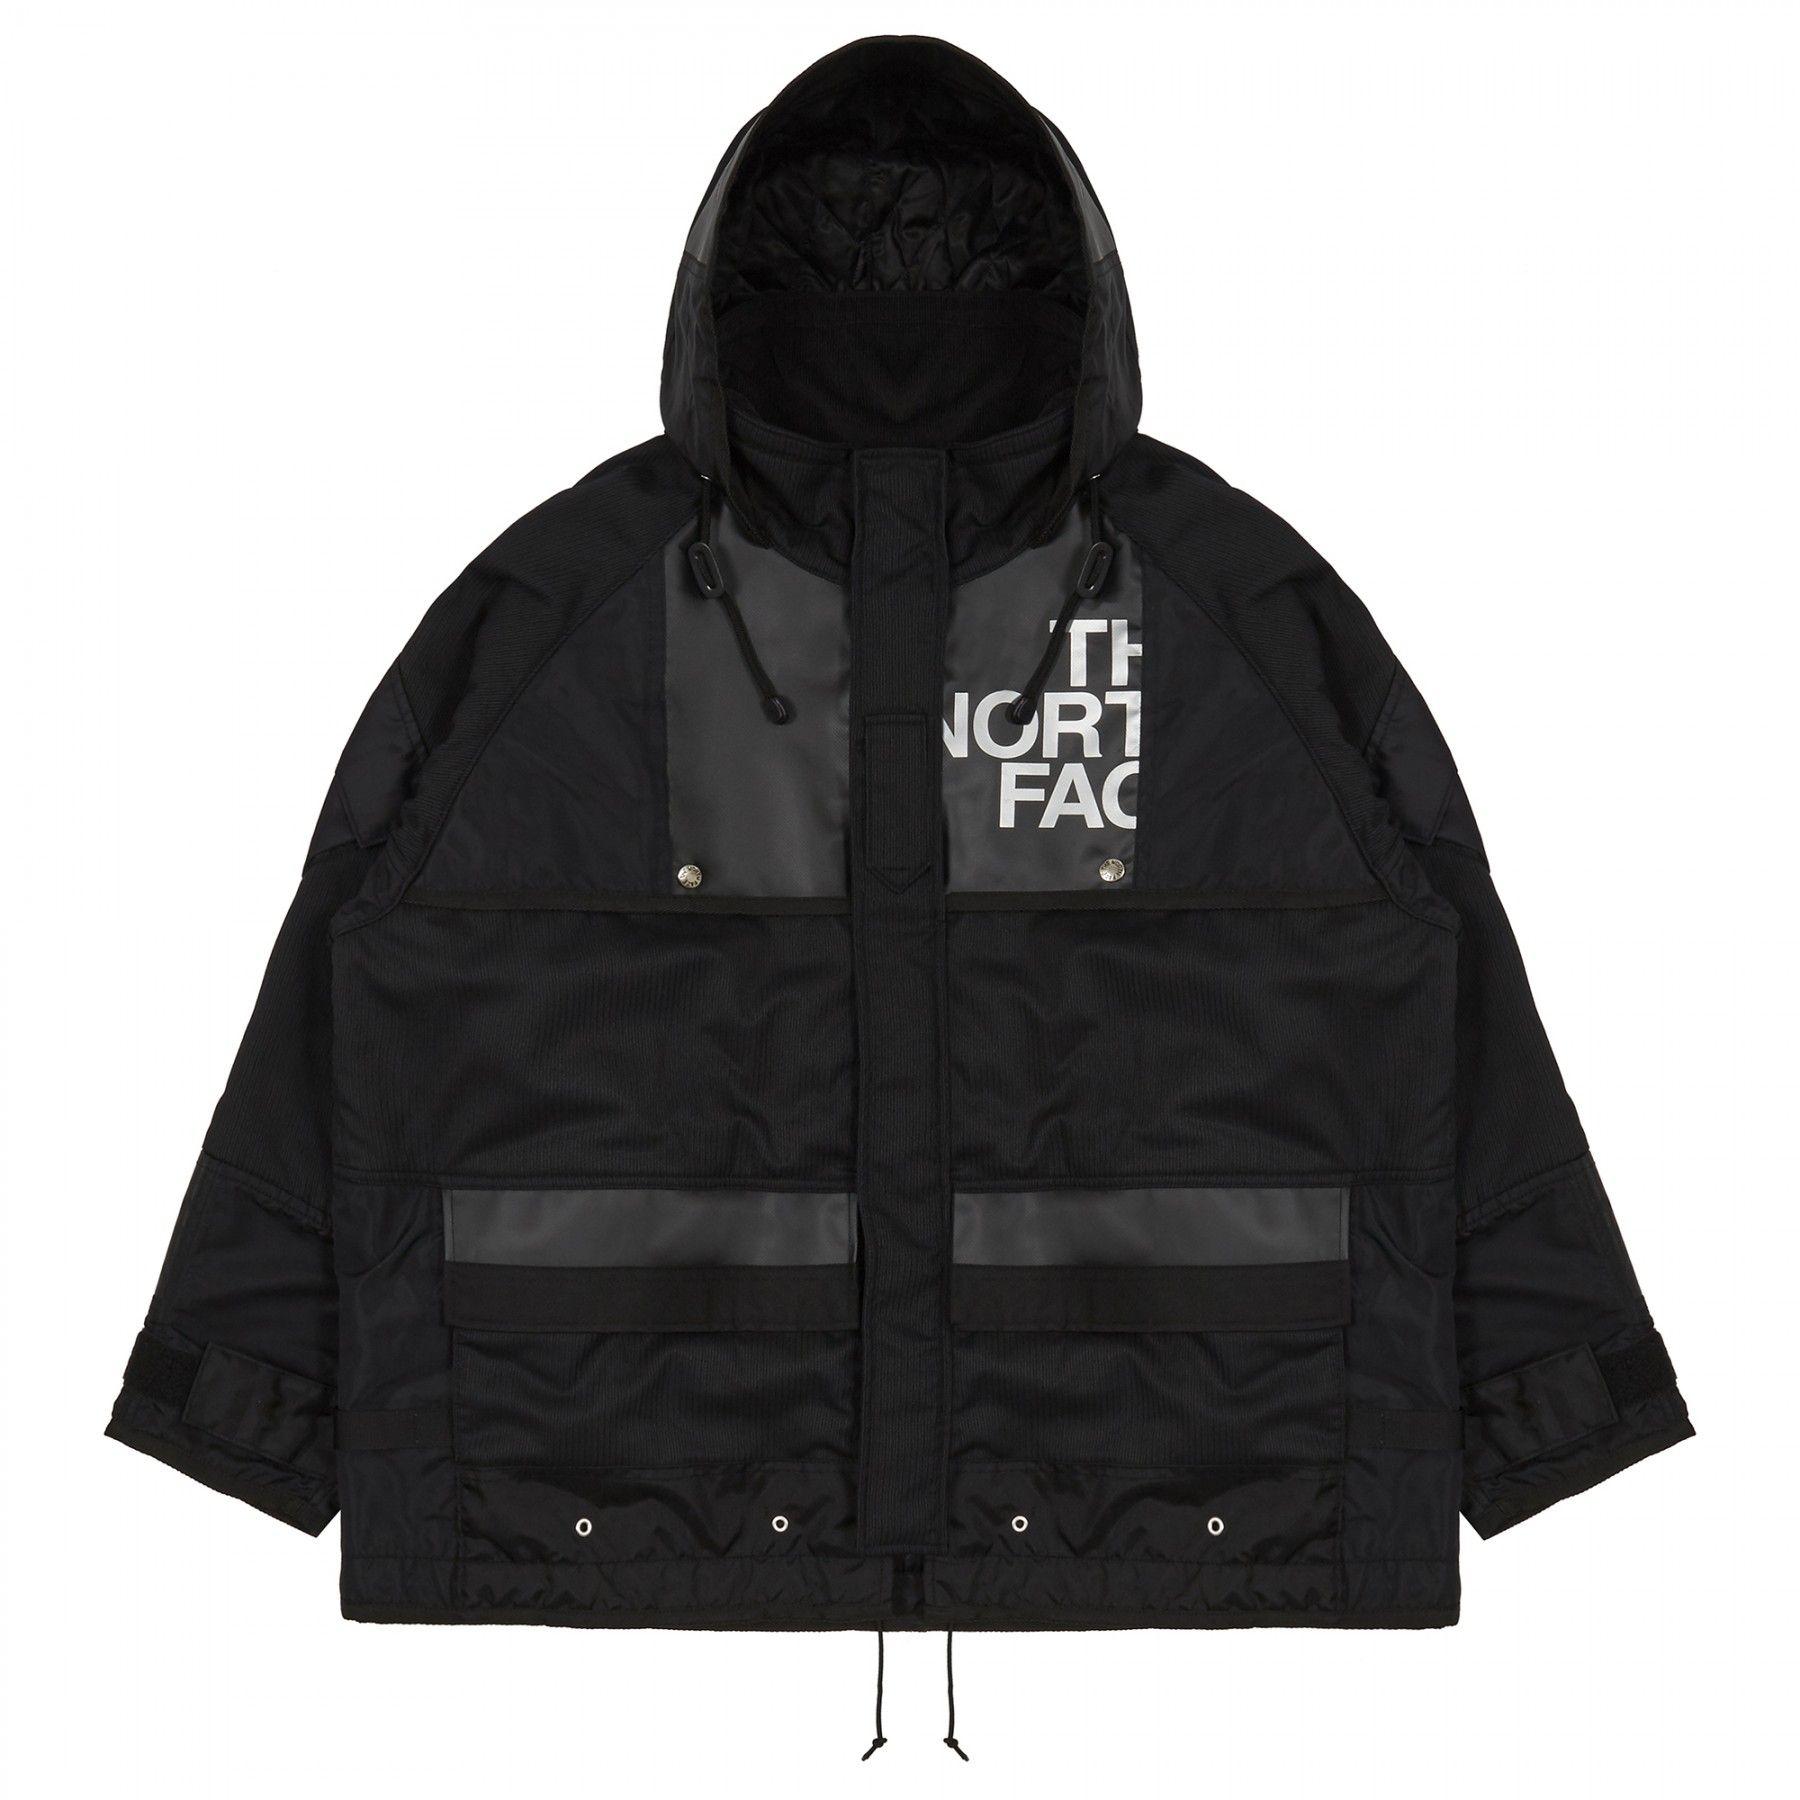 Junya Watanabe Man X The North Face Daffle Bag Remake Long Jacket Black Long North Face Jacket Jackets Stylish Outerwear [ 1800 x 1800 Pixel ]